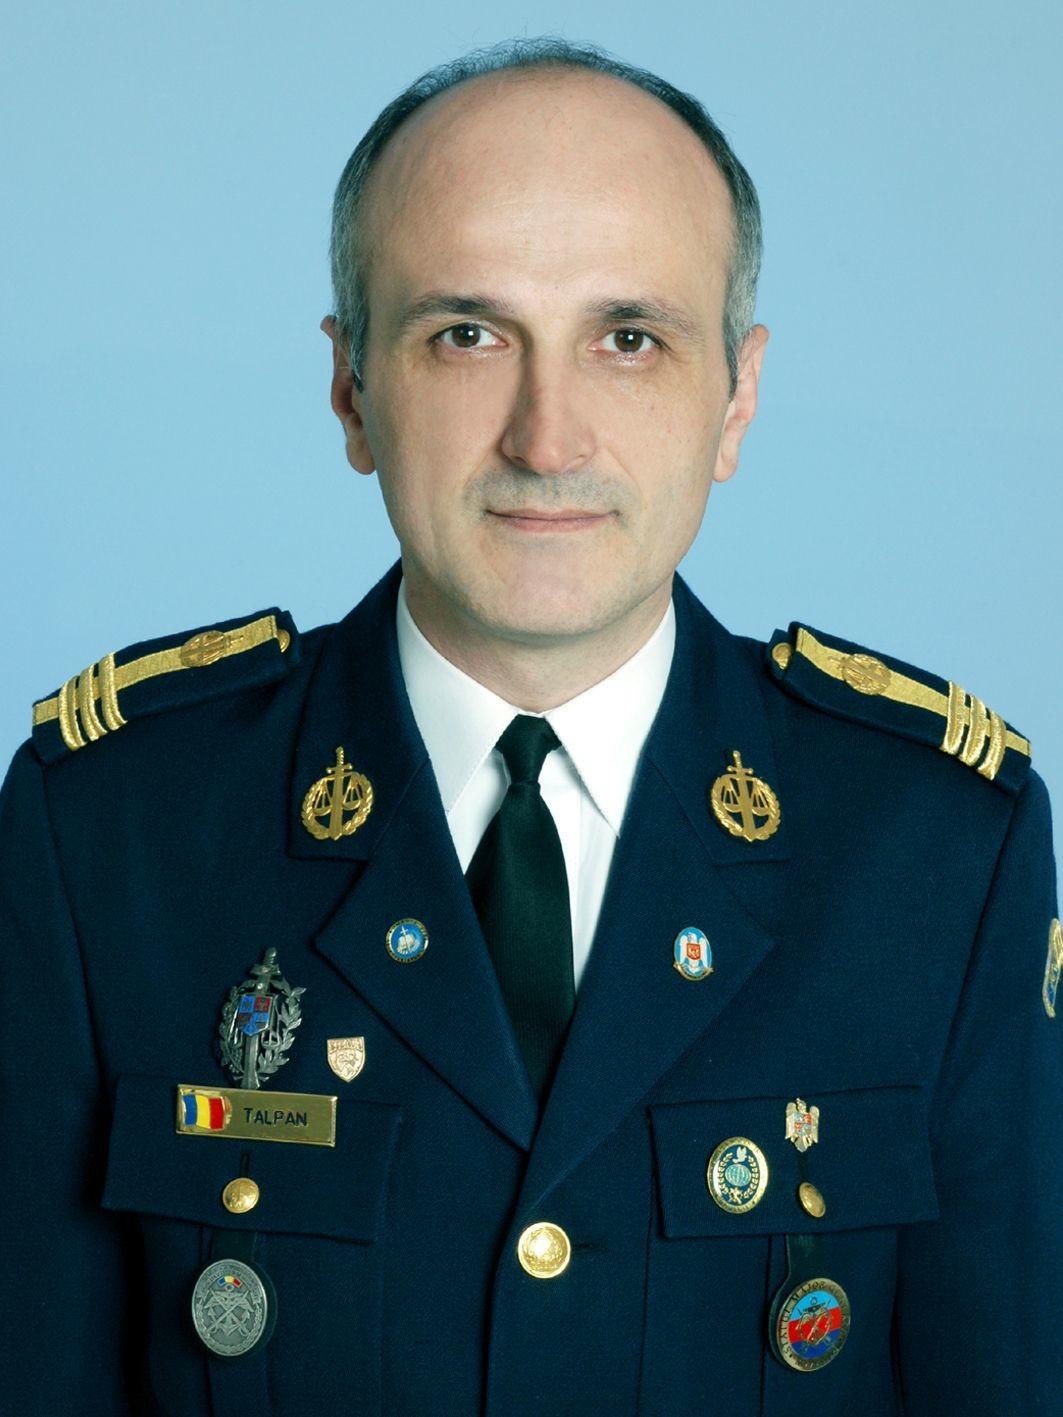 Florin Talpan